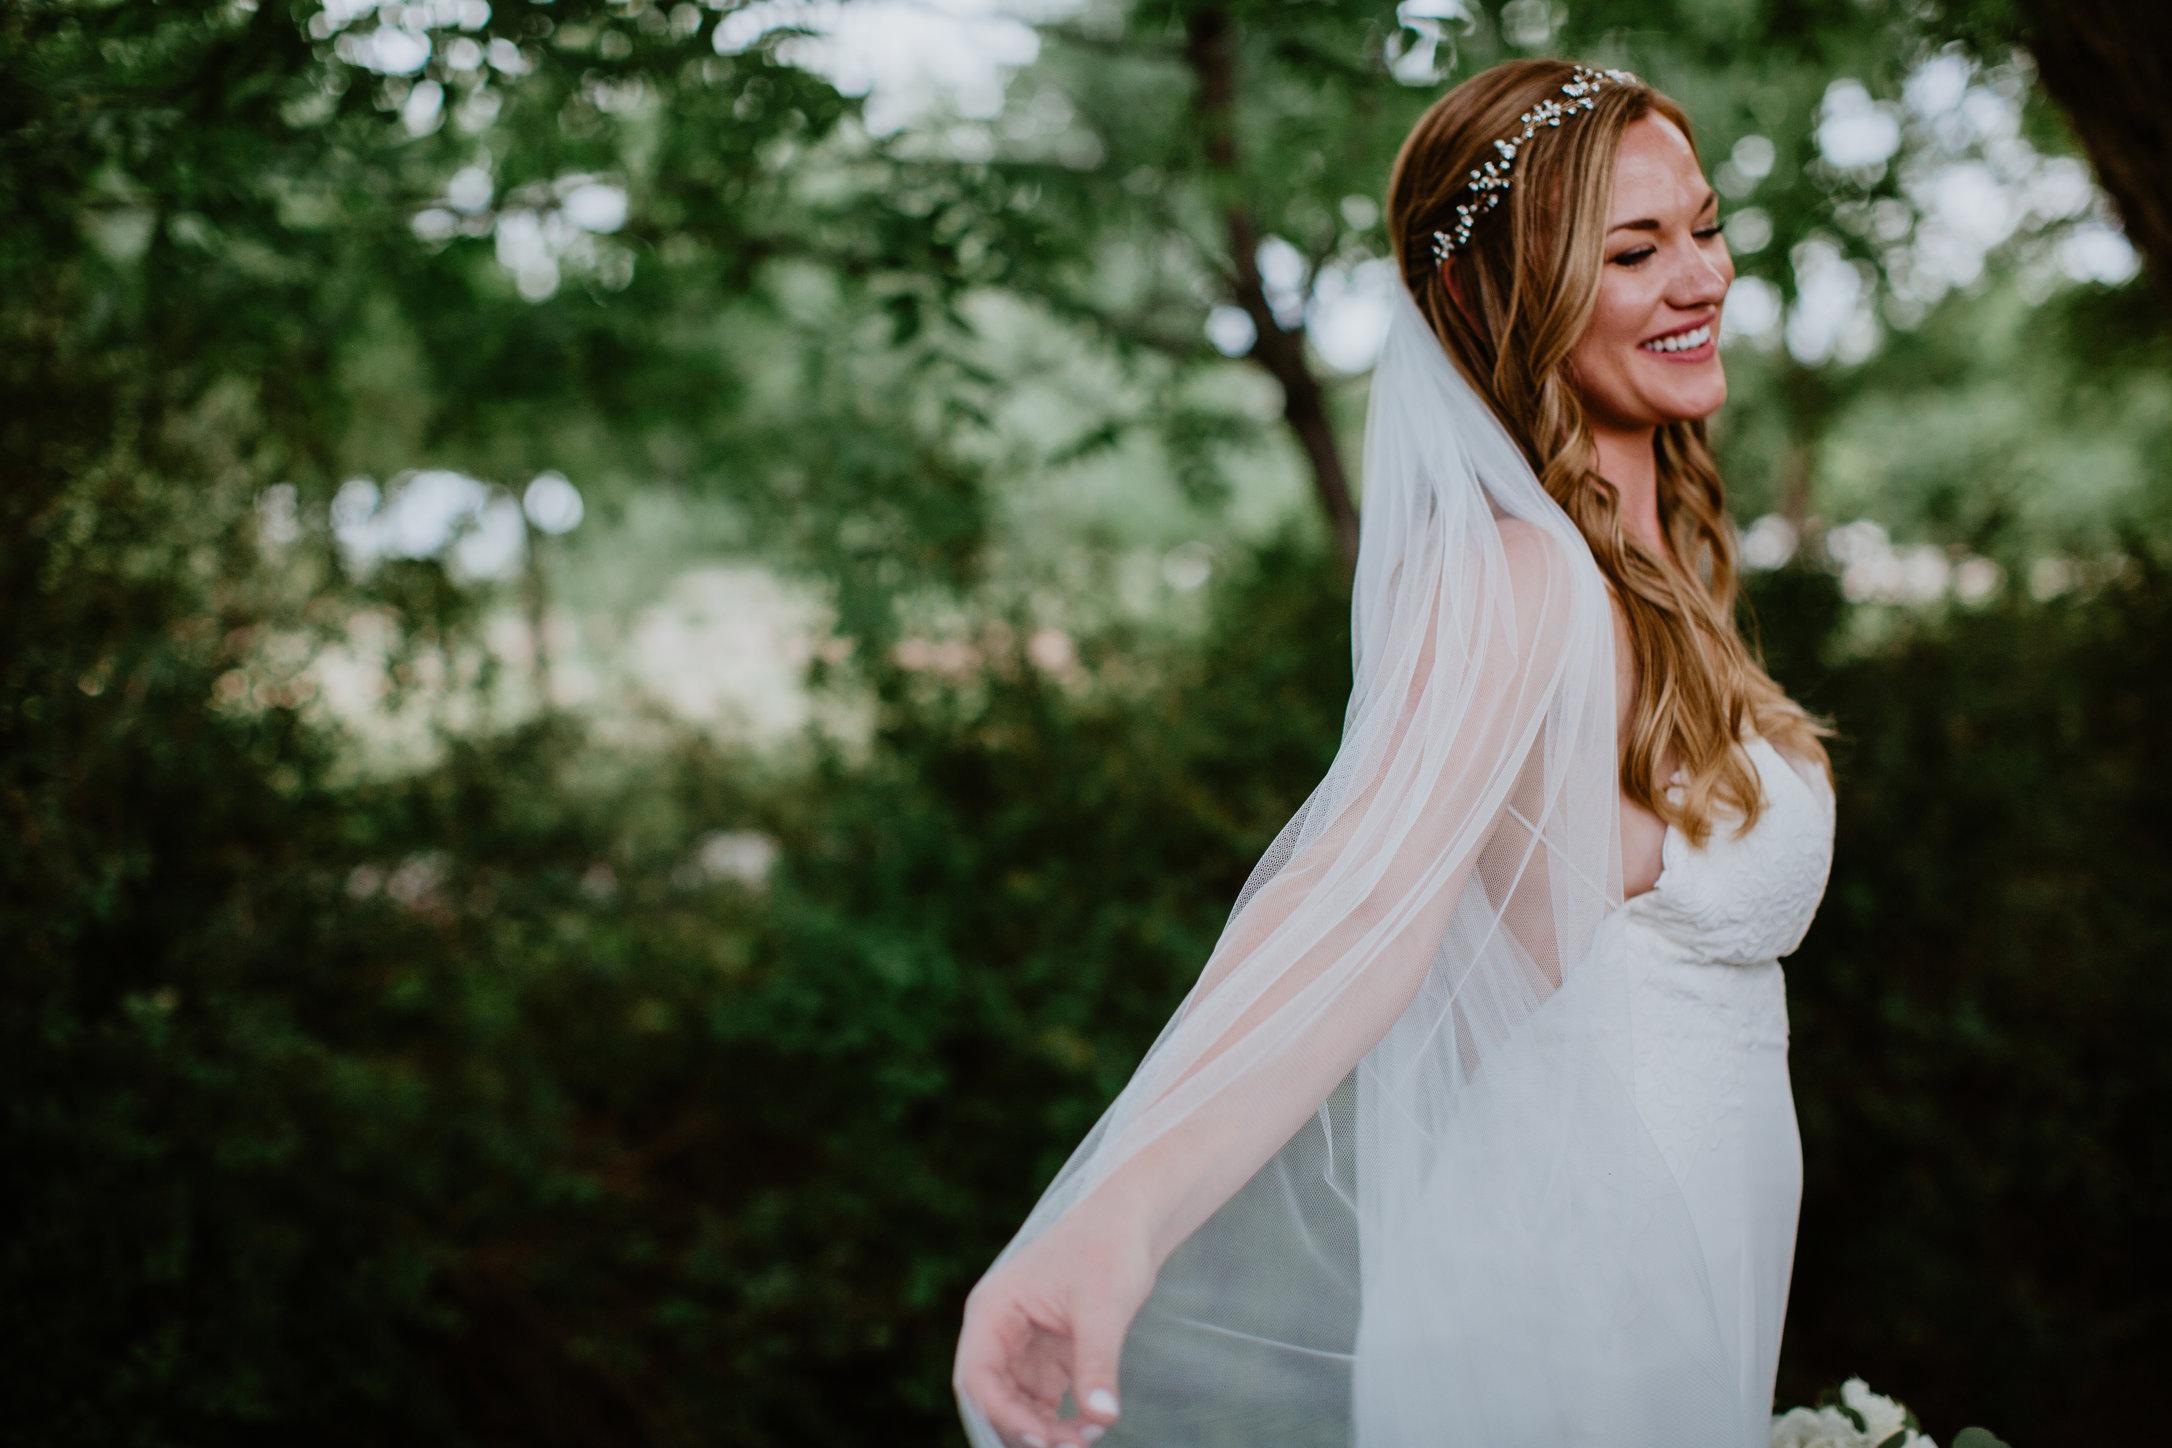 DandA-wedding-723.jpg